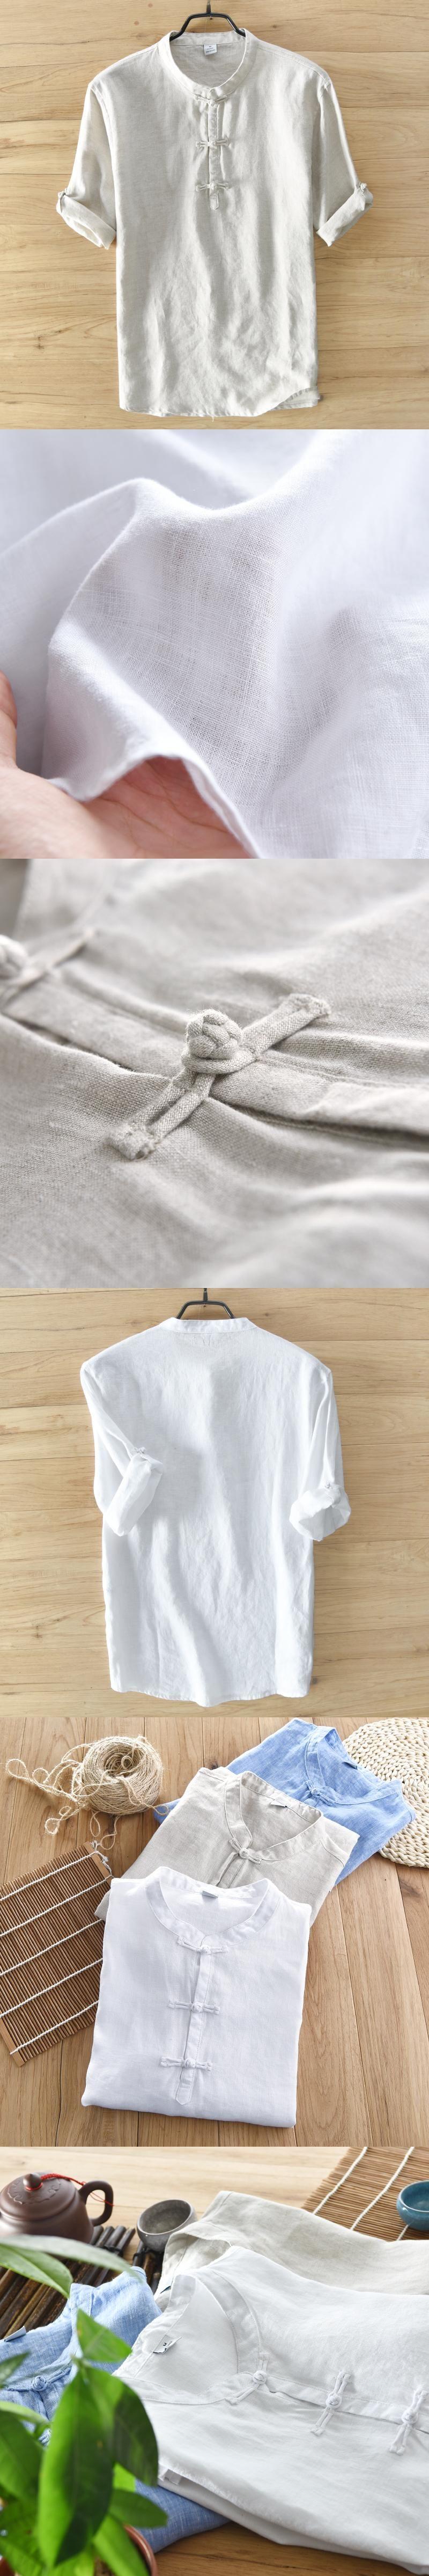 3c984147f5 Brand linen shirt men short sleeve pure flax men shirts Italy business  casual mens shirt fashion